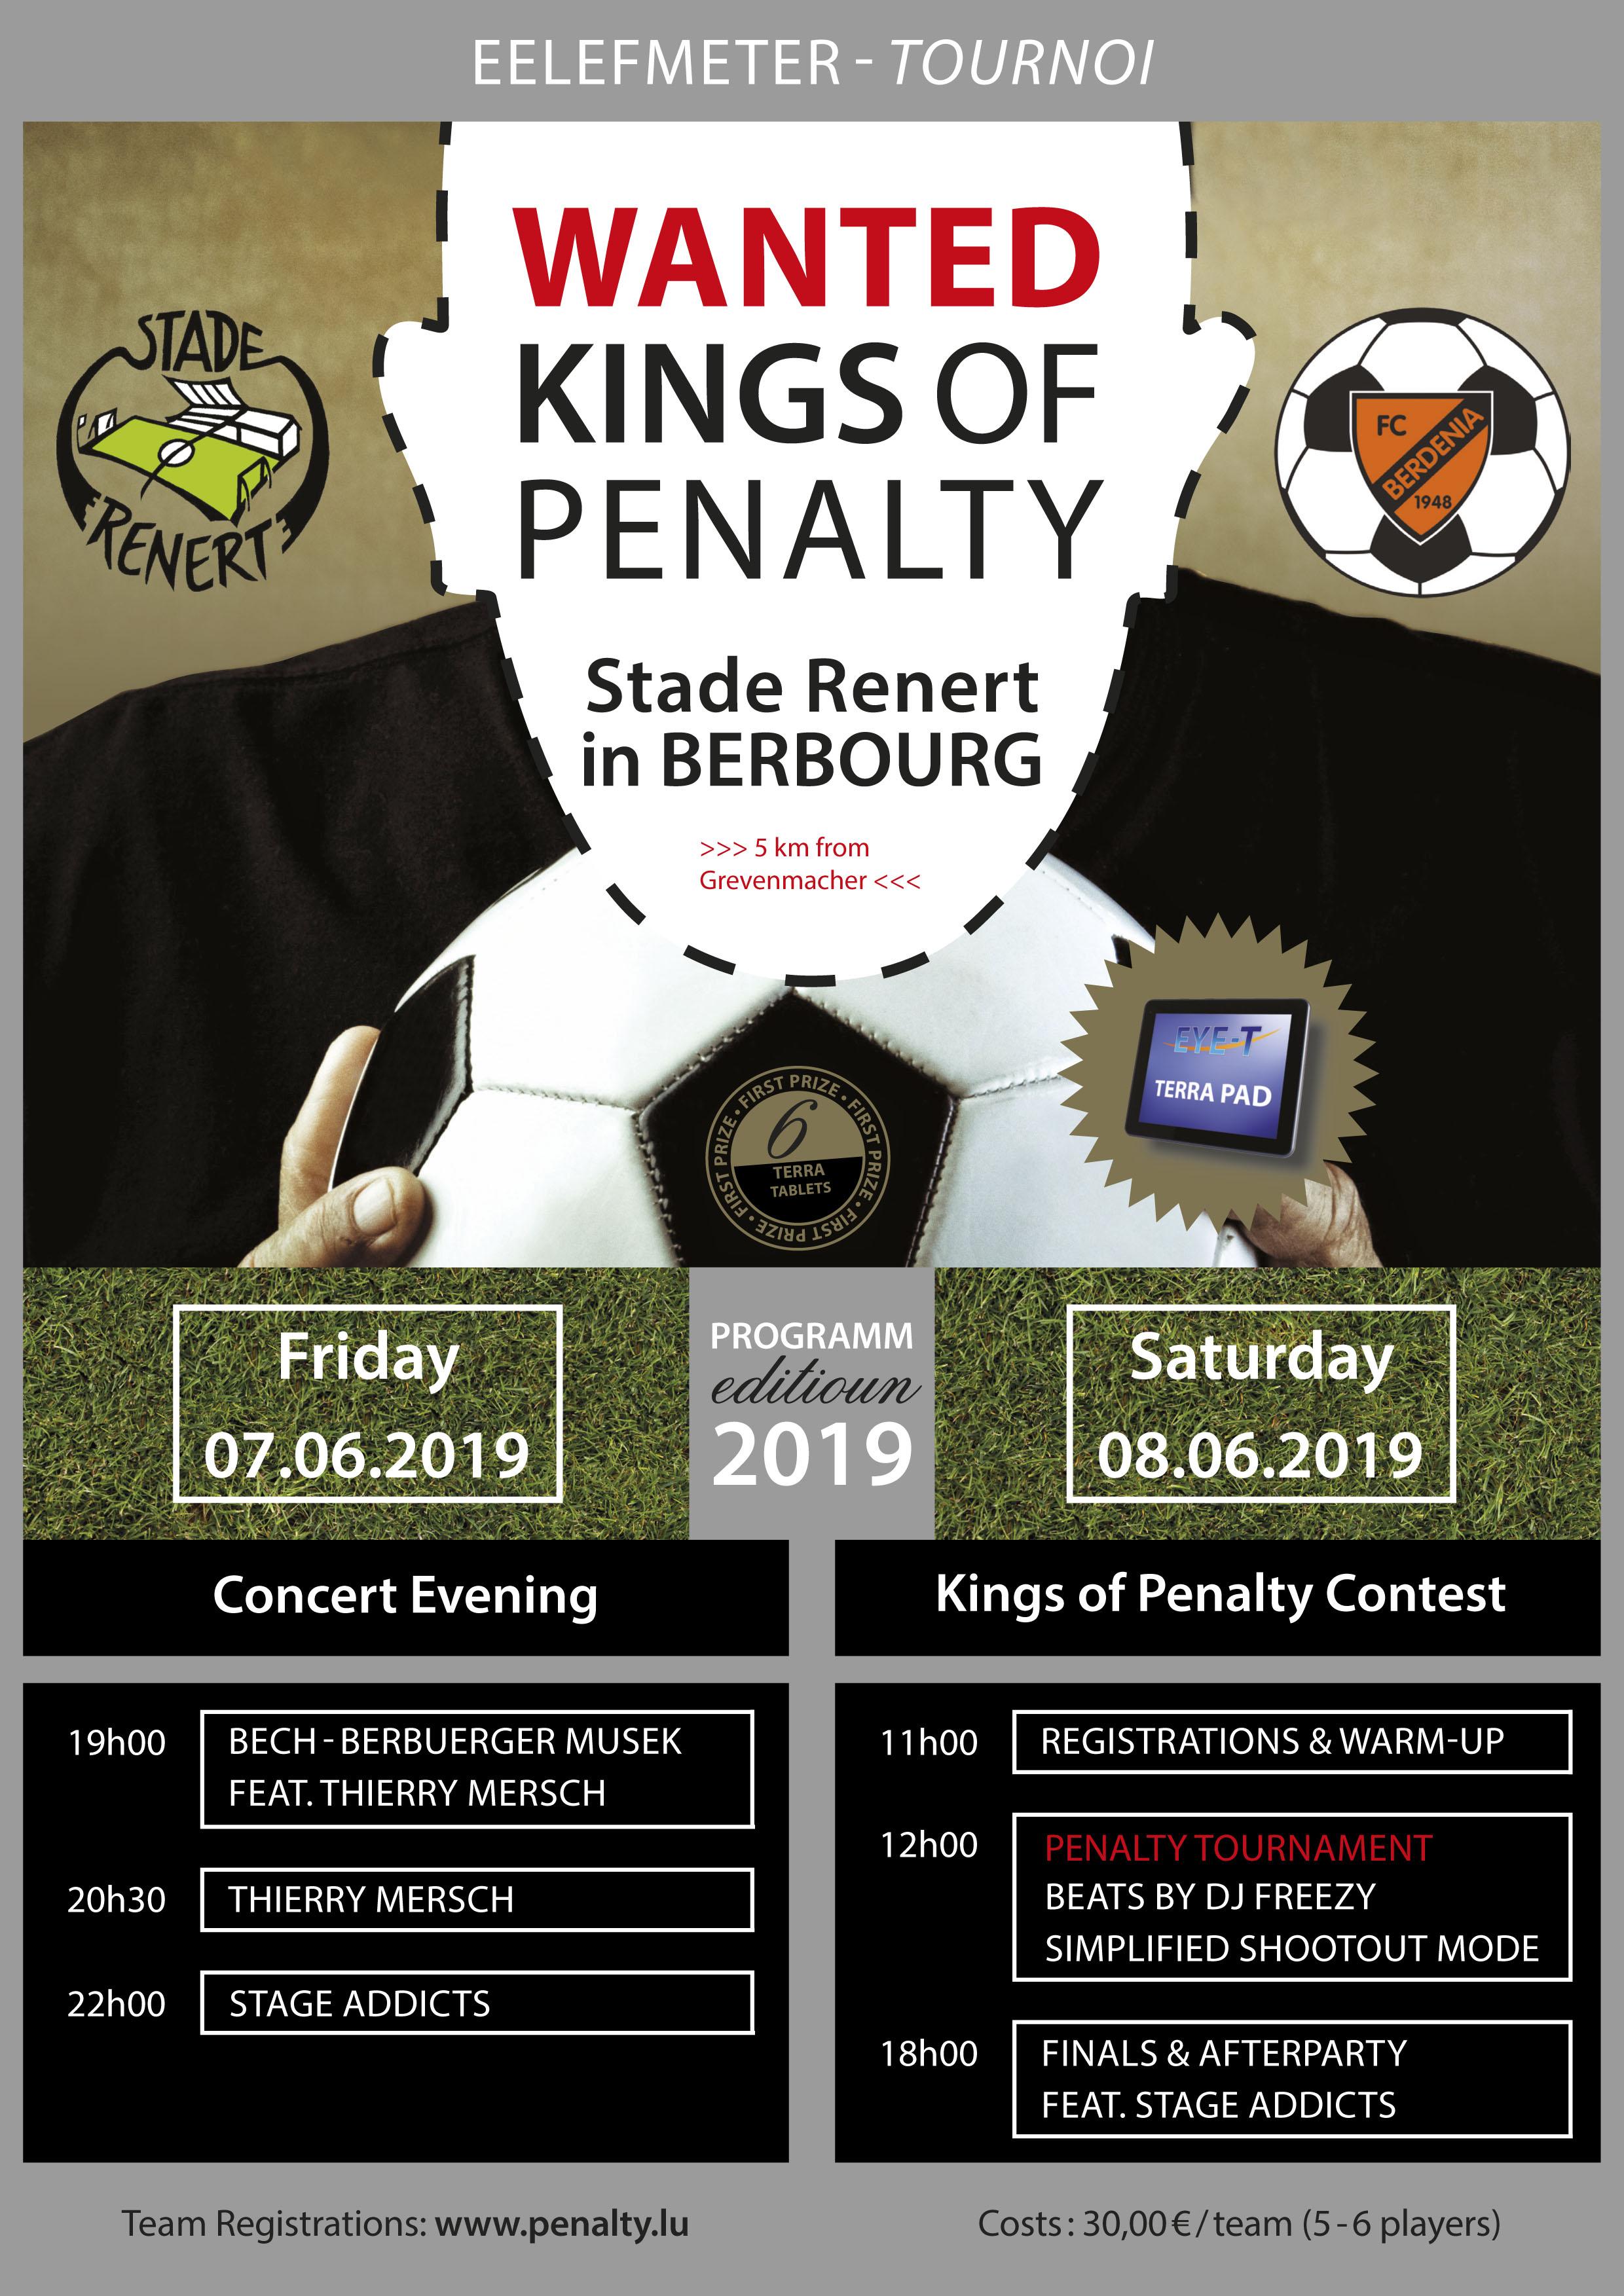 Kings of Penalty 2019 - REGISTER NOW